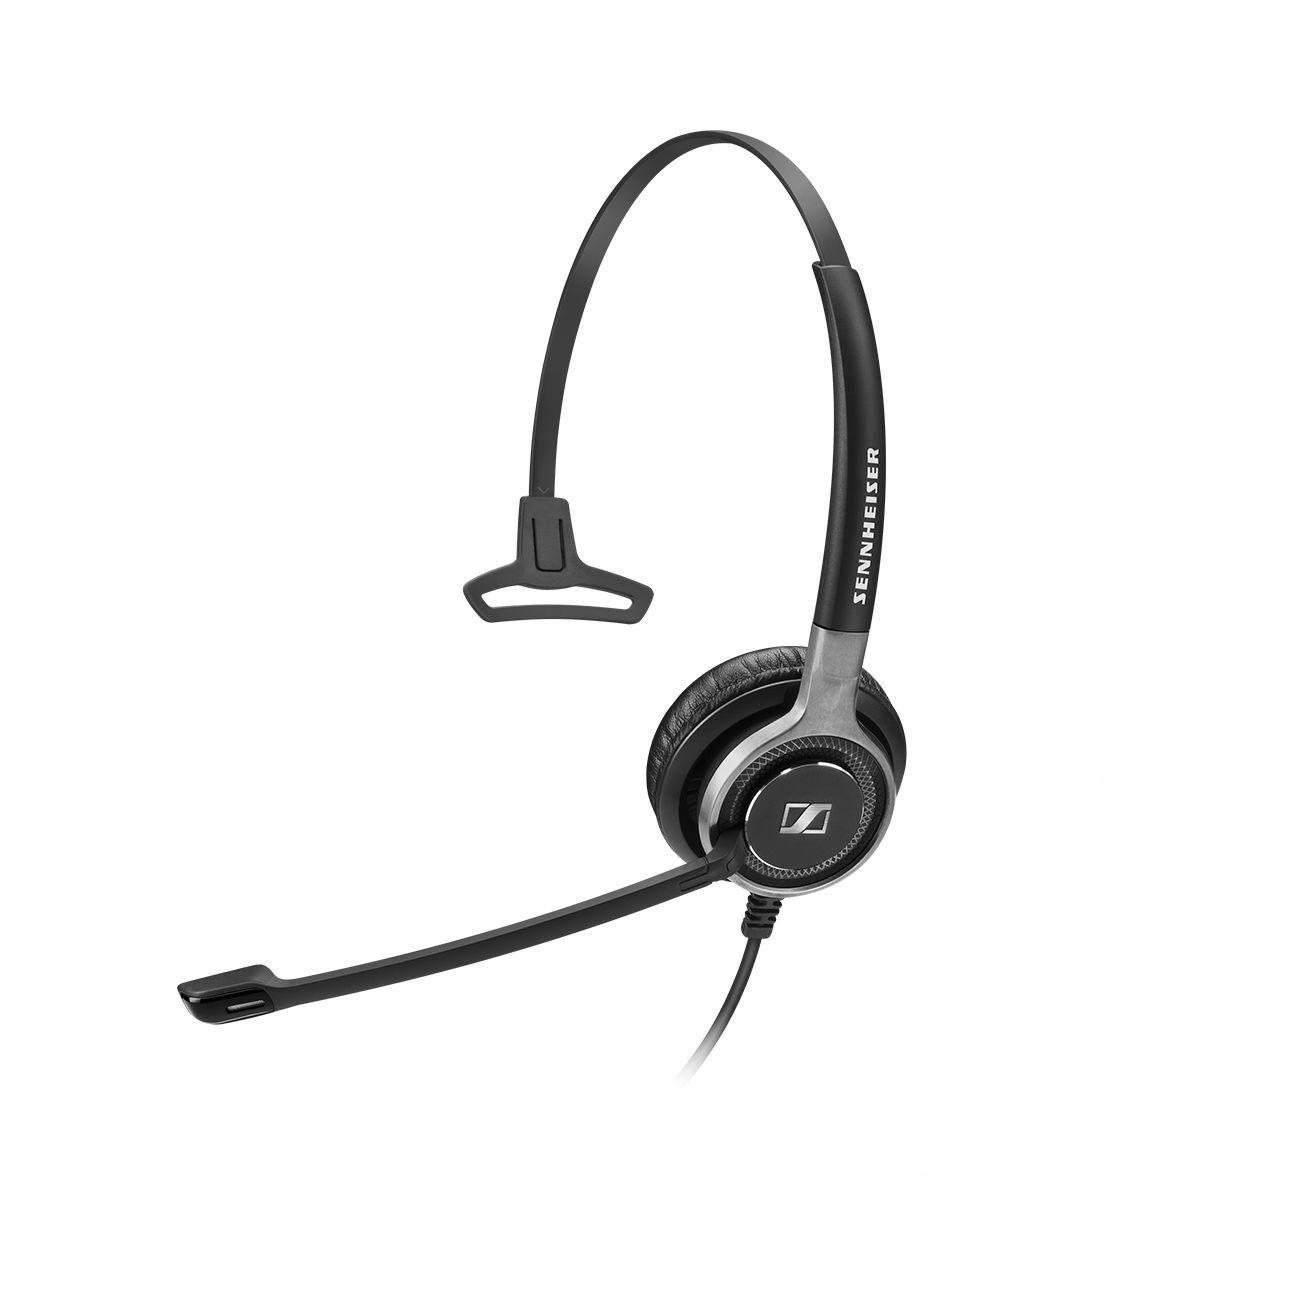 Sennheiser Century SC630 Monaural Noise Cancelling Headset